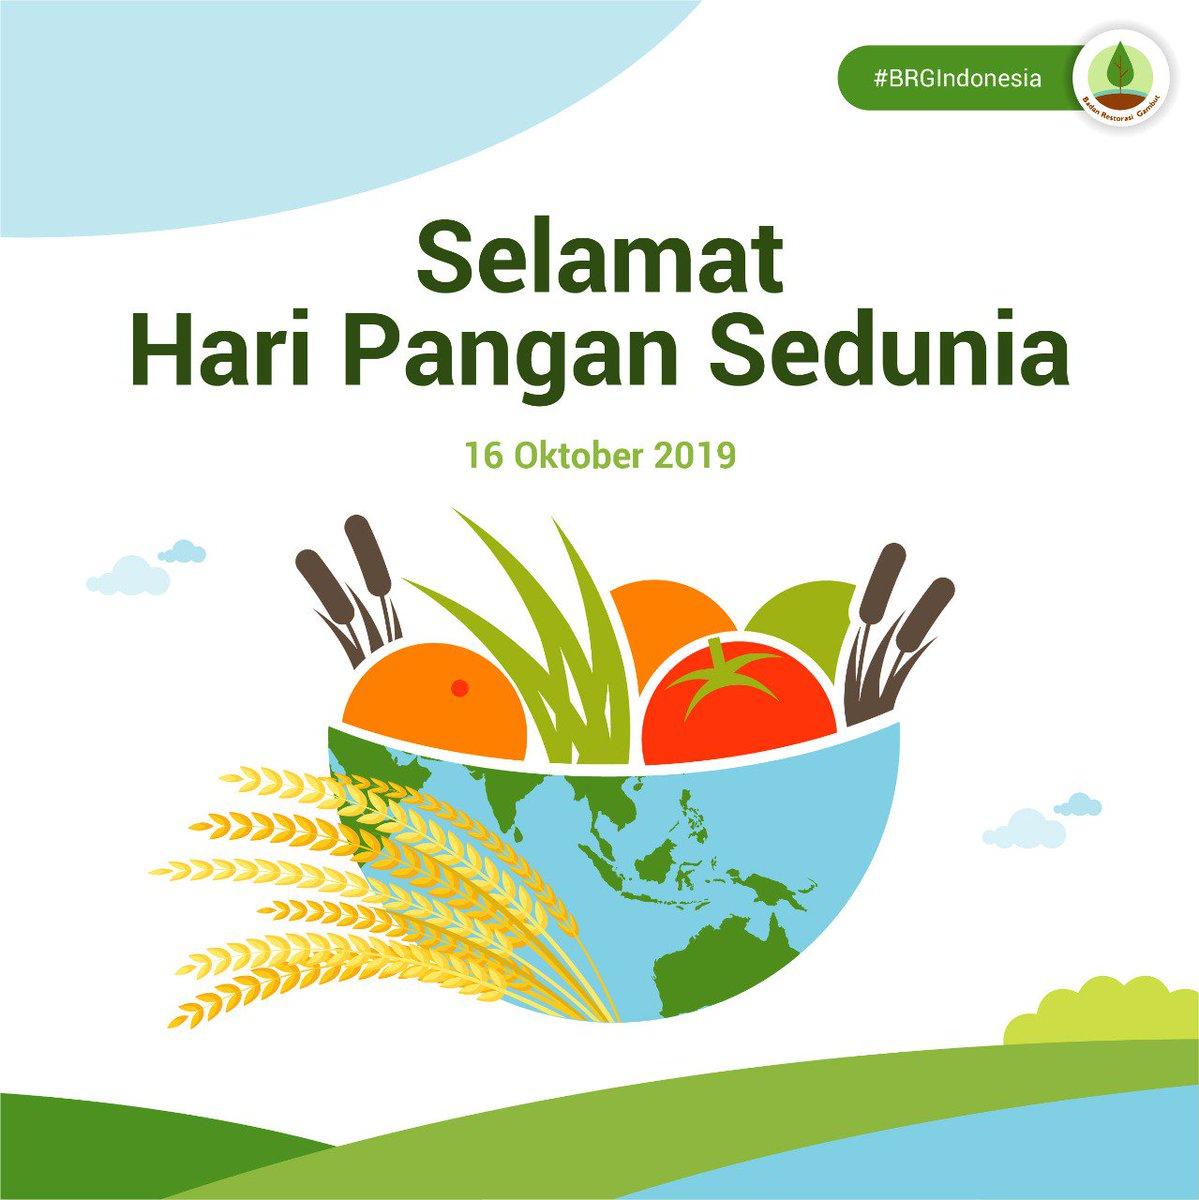 Brg Indonesia V Twitter Hari Pangan Sedunia Atau World Food Day Diperingati Setiap Tanggal 16 Oktober Zerohungerworld Worldfoodday2019 Haripangansedunia2019 Gambut Ayojagagambut Brgindonesia Https T Co Bv8qsycl2v